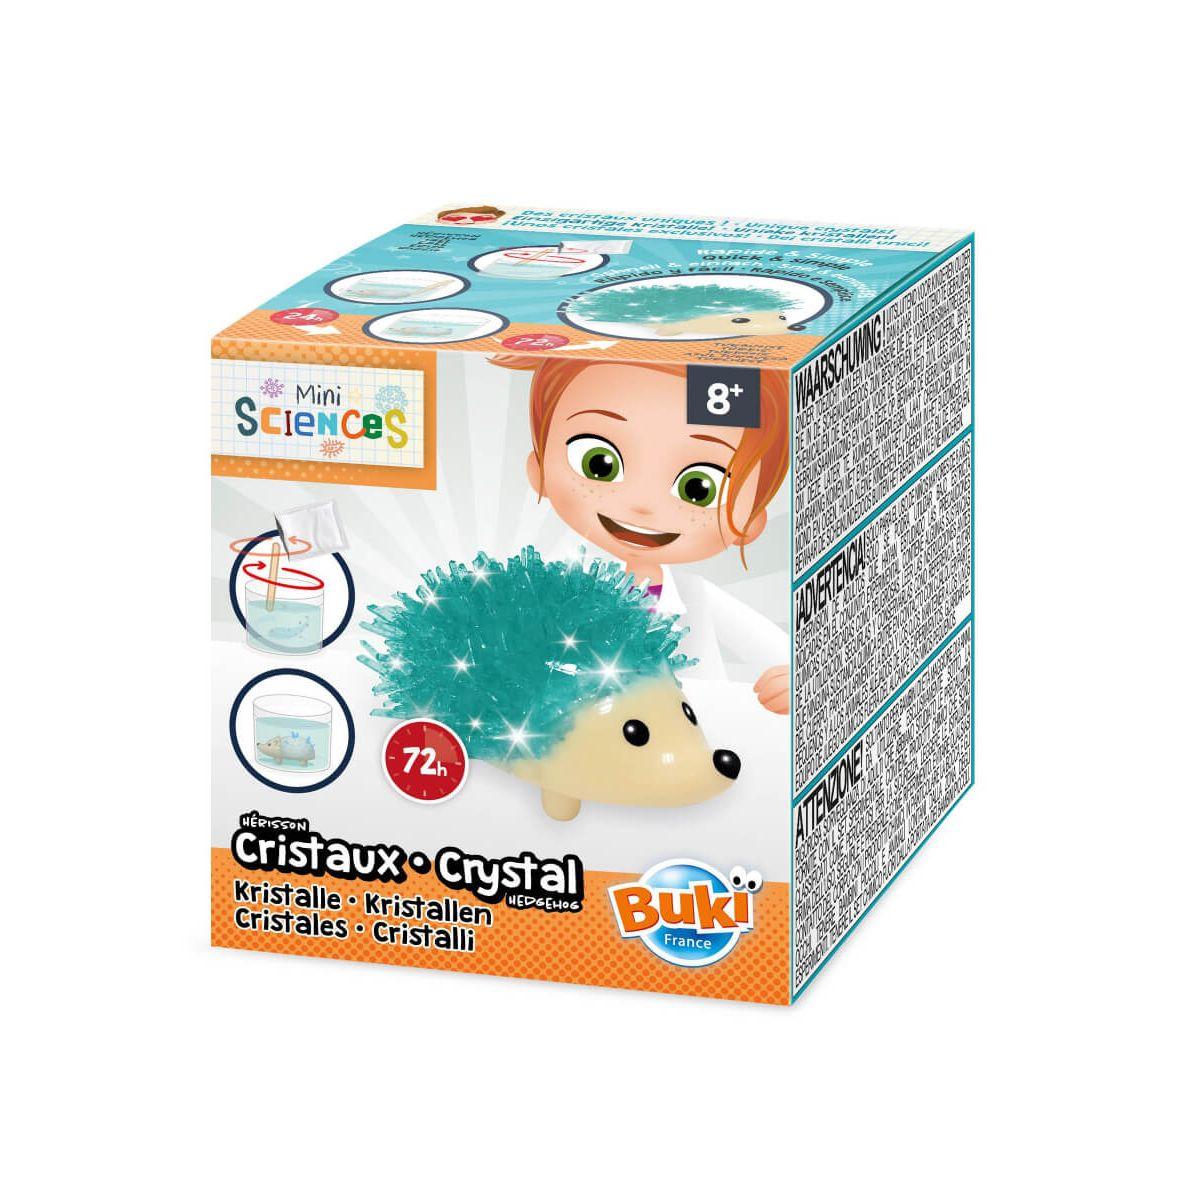 Buki - Mini sciences cristaux